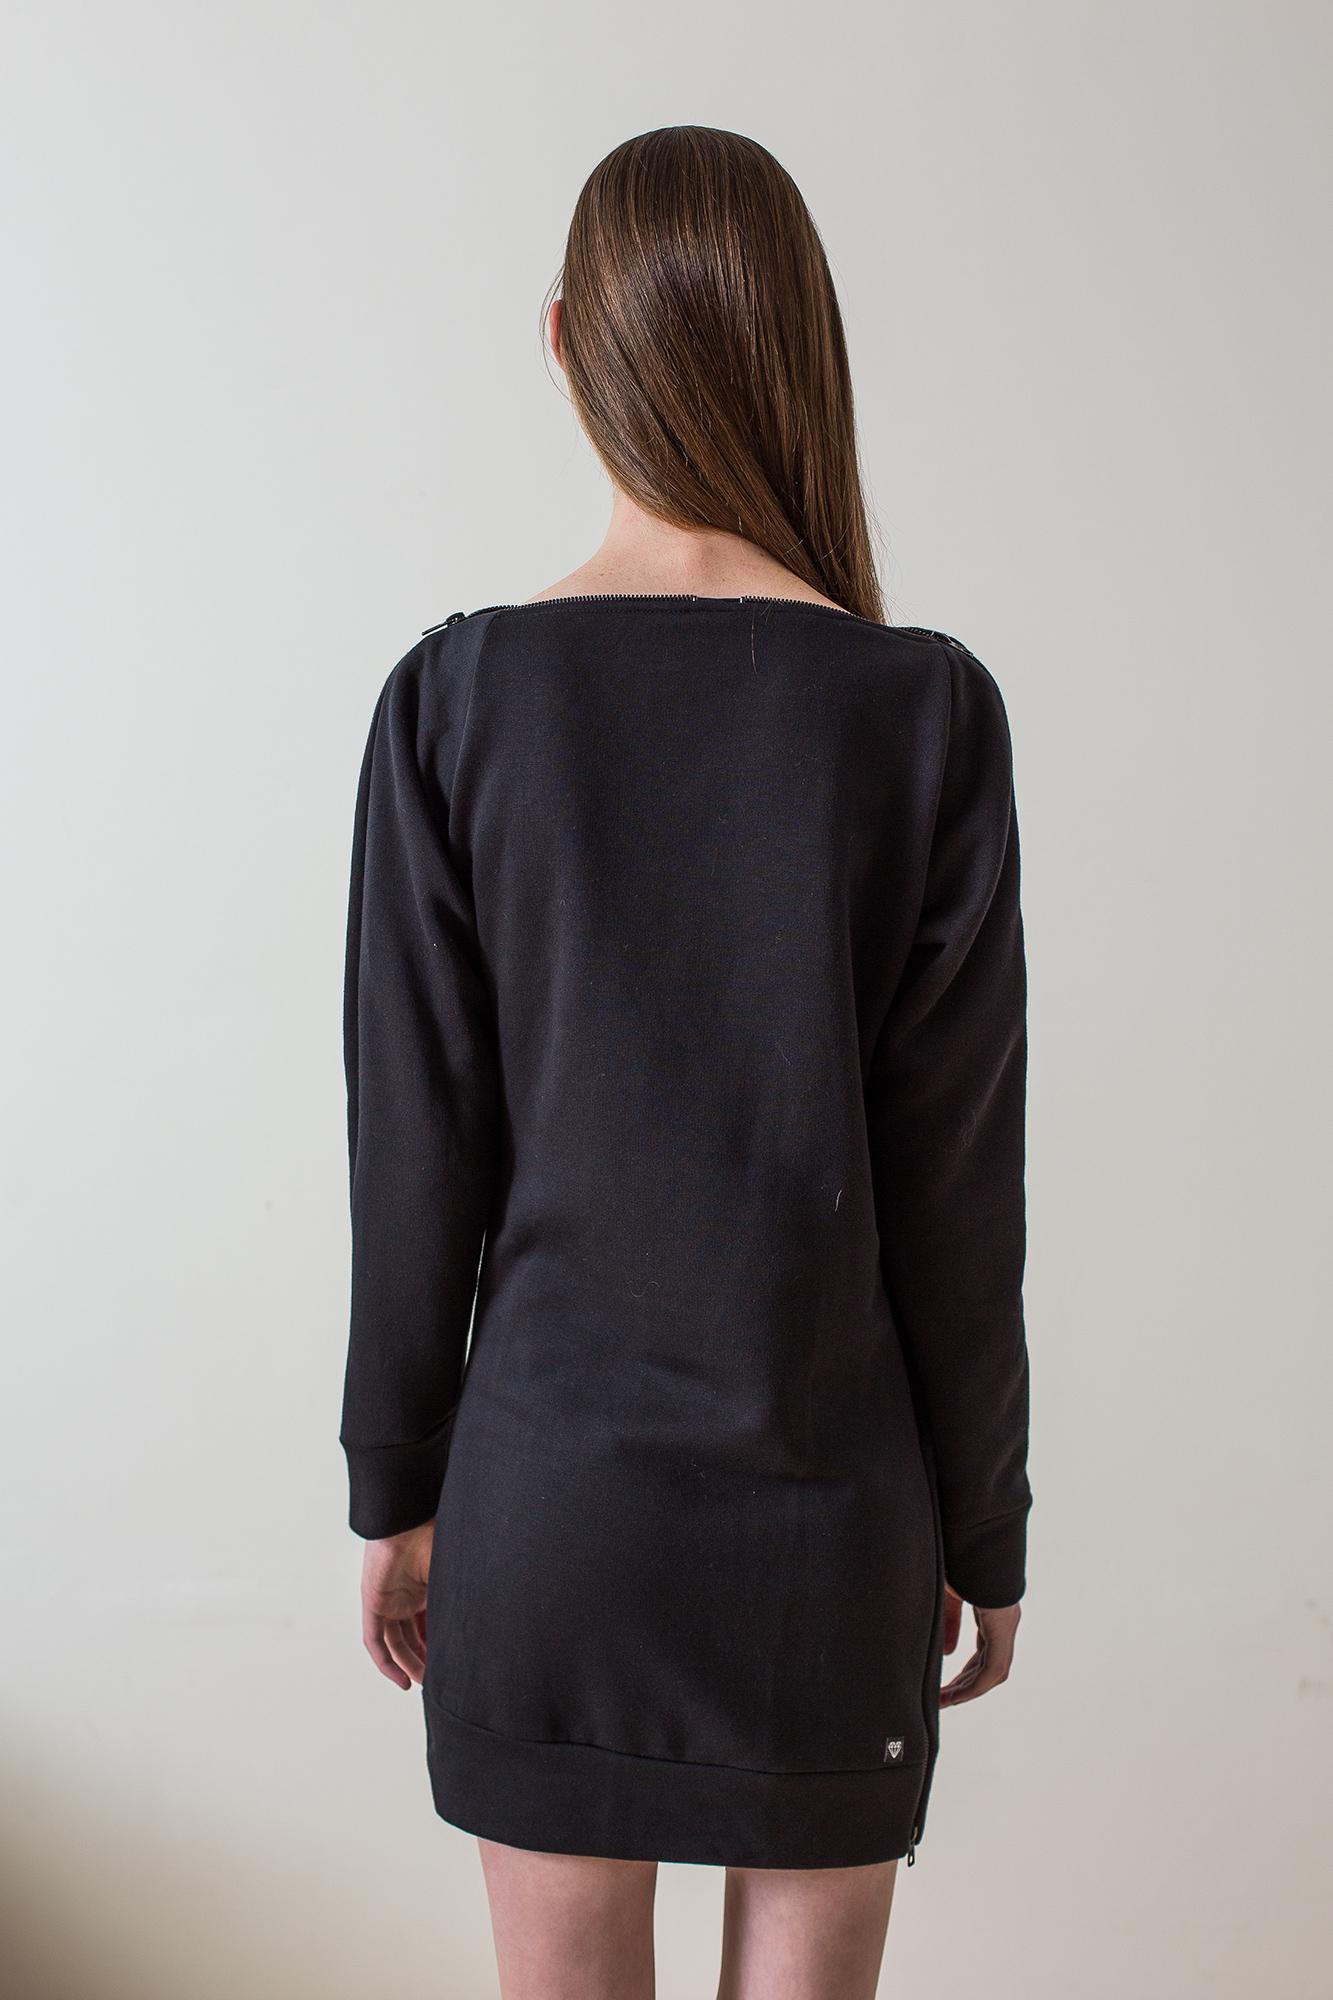 wearenotsisters_wrns_still-sweatshirt_02